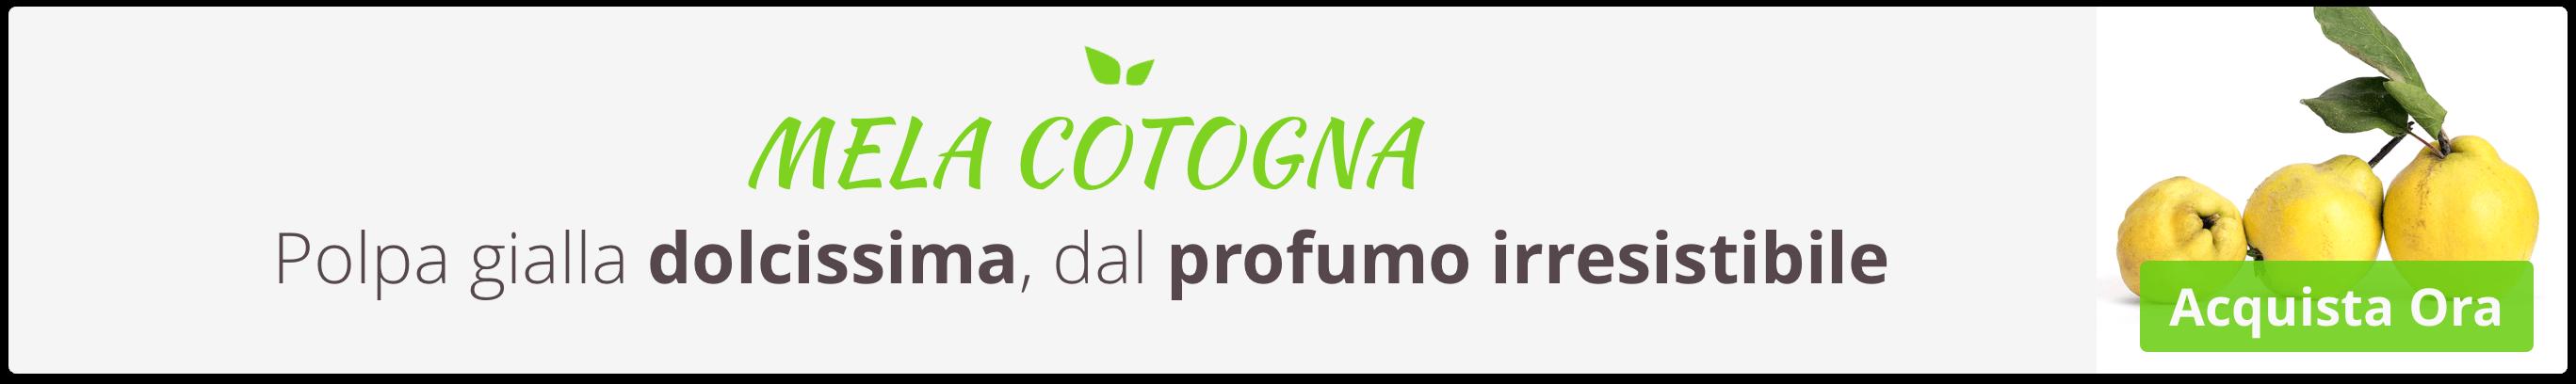 Acquista Online Mela Cotogna, Pera